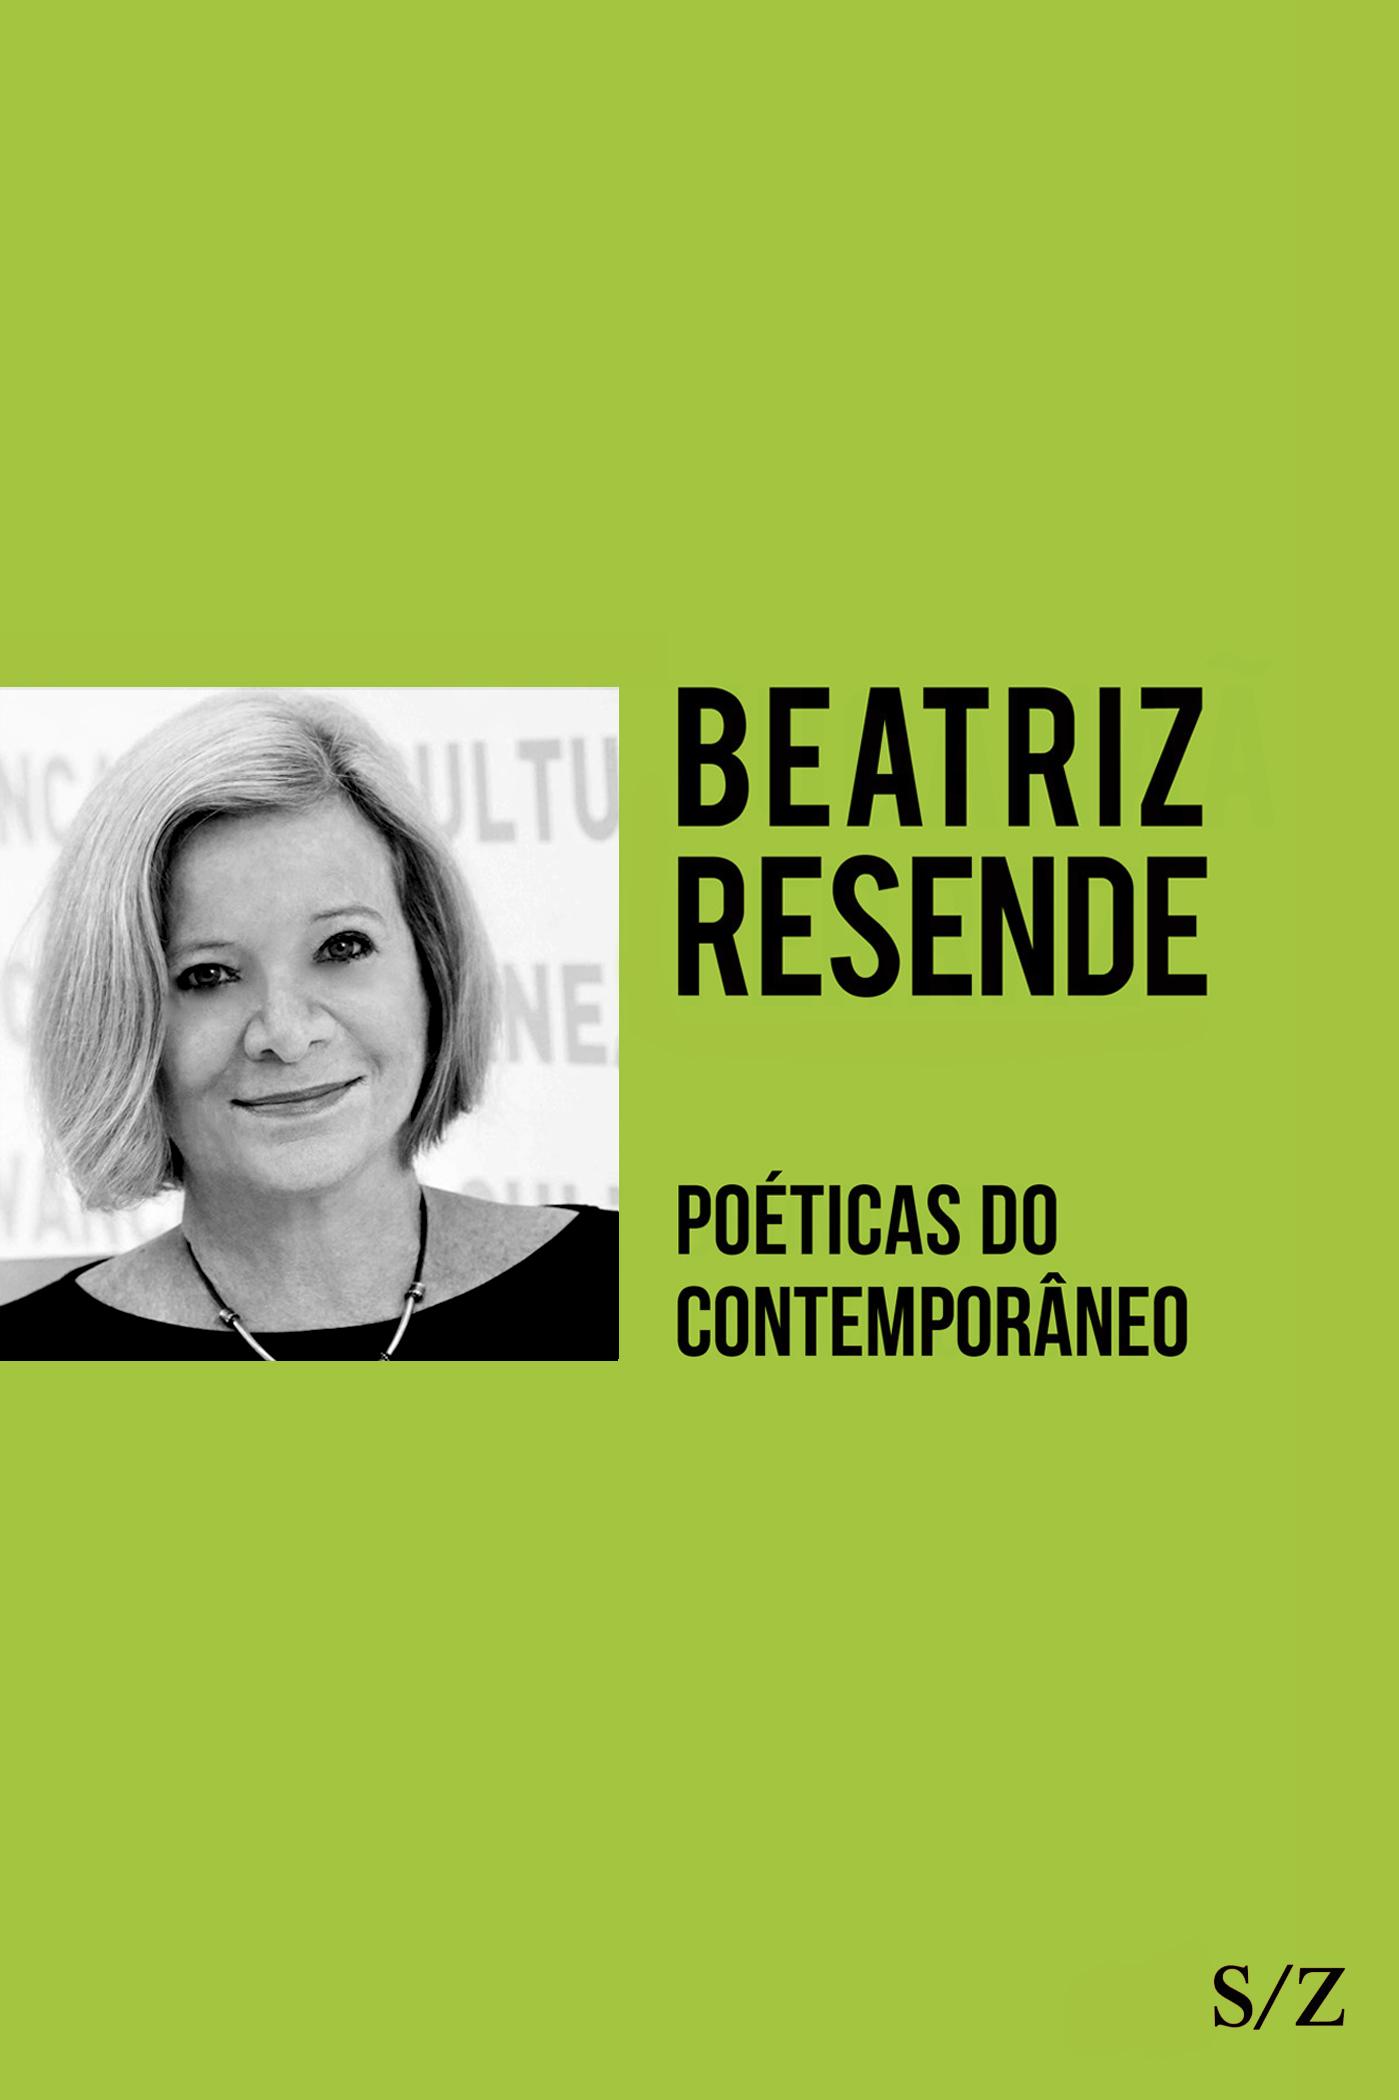 poética_beatriz resende sz